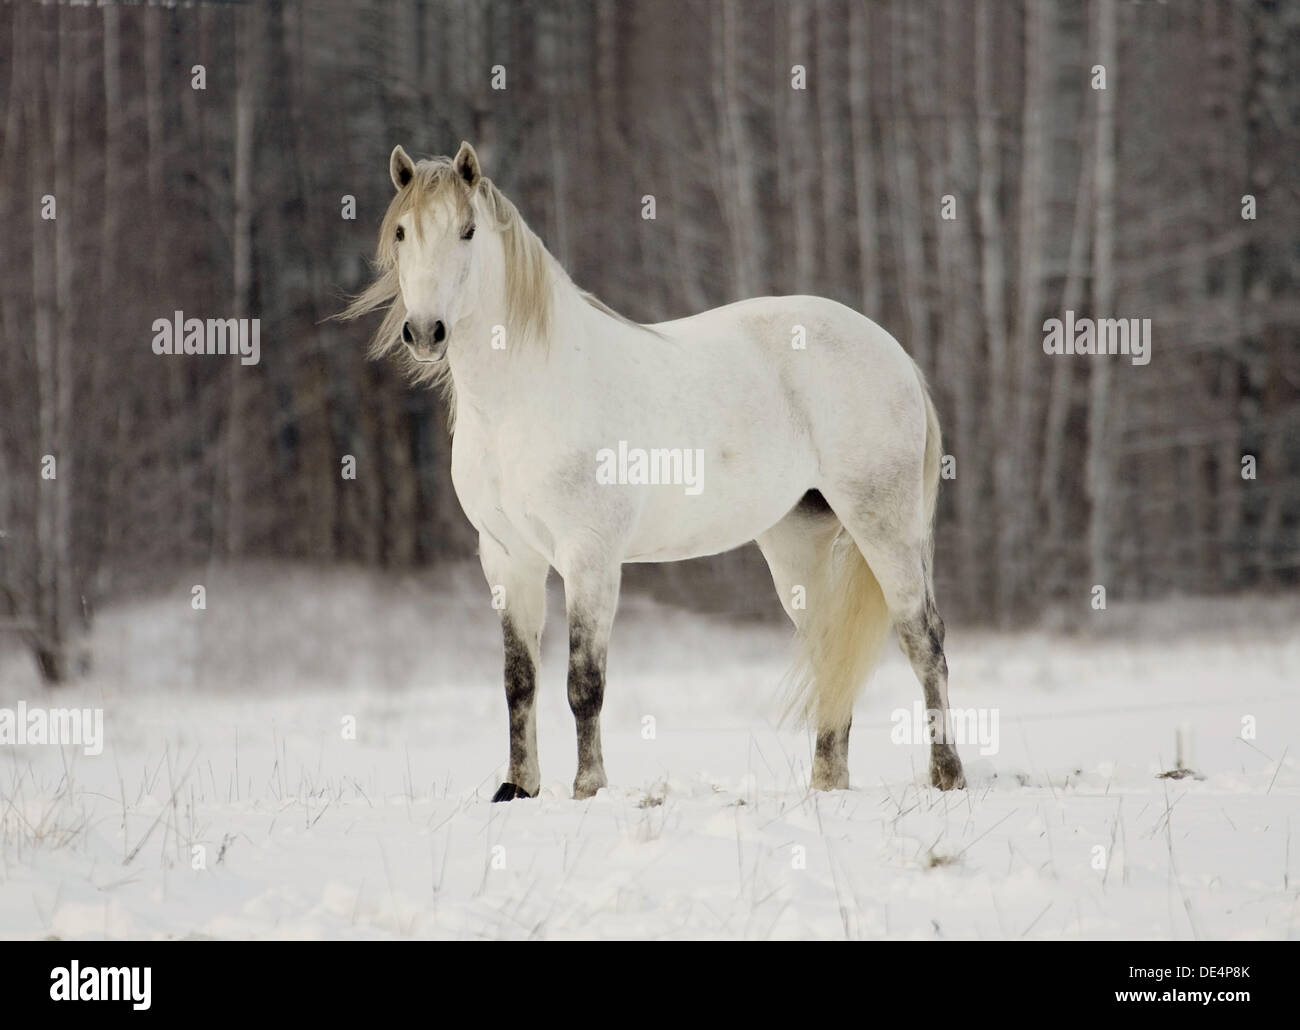 Lusitano horse in snow. Sweden - Stock Image